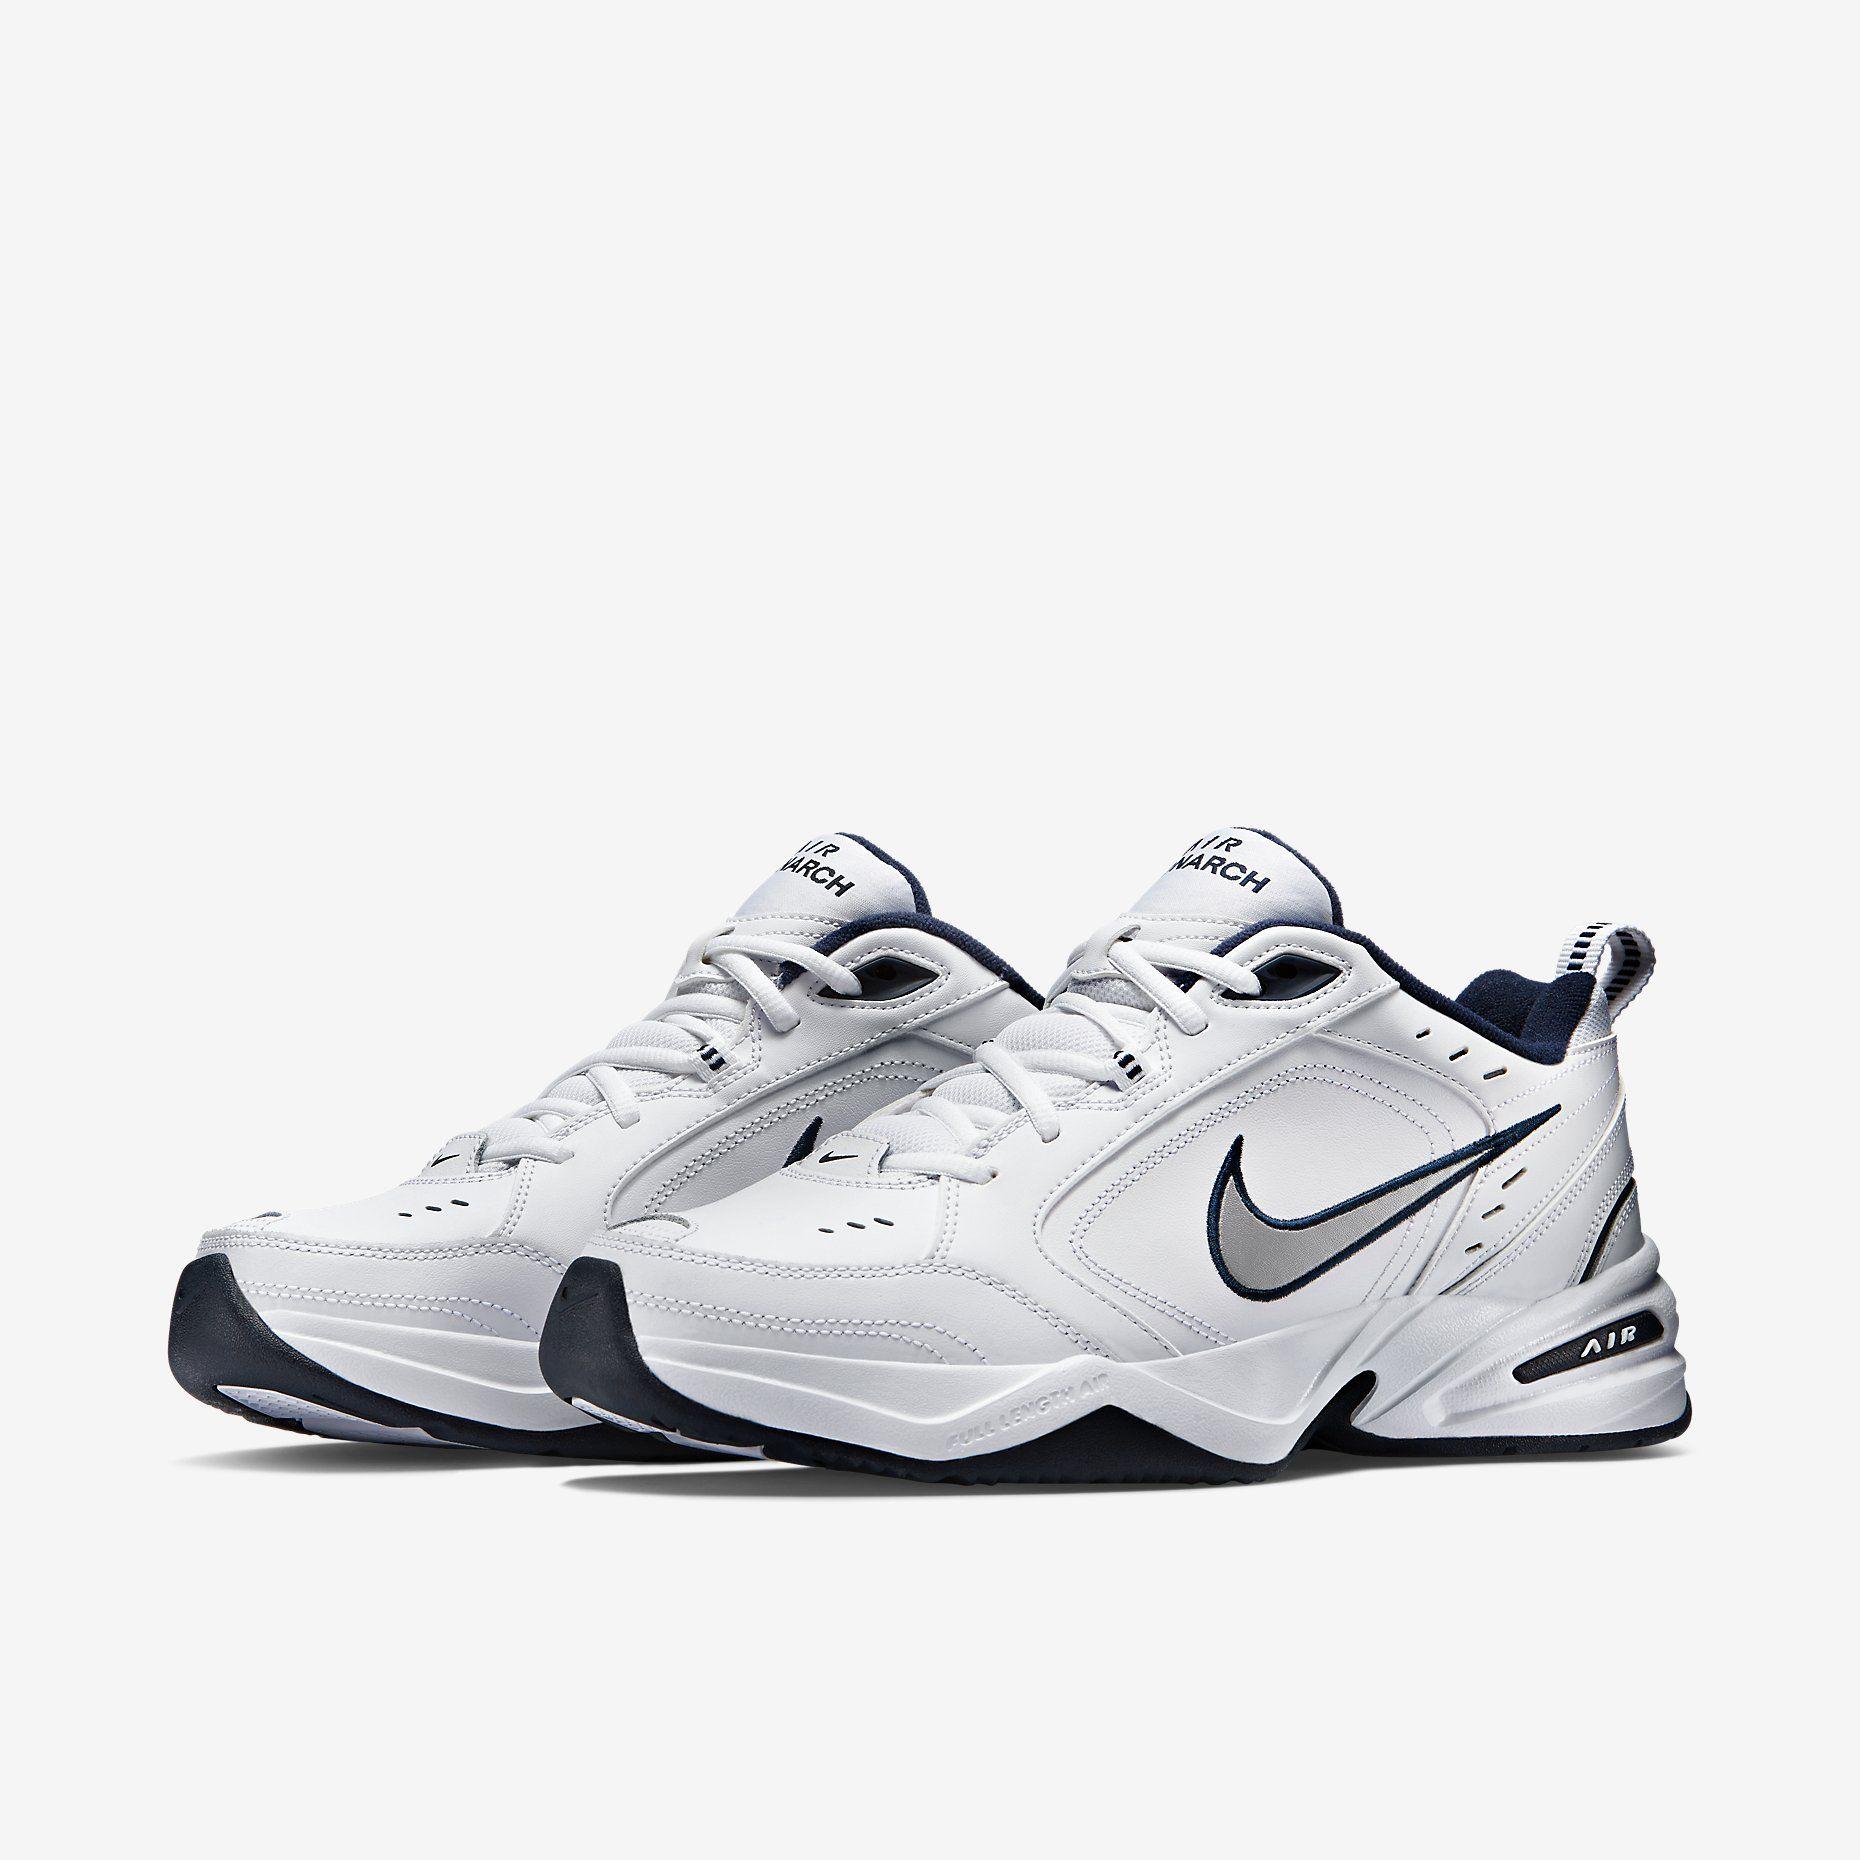 quality design fbd20 8125b Nike Air Monarch IV (Extra-Wide) Men s Training Shoe. Nike Store